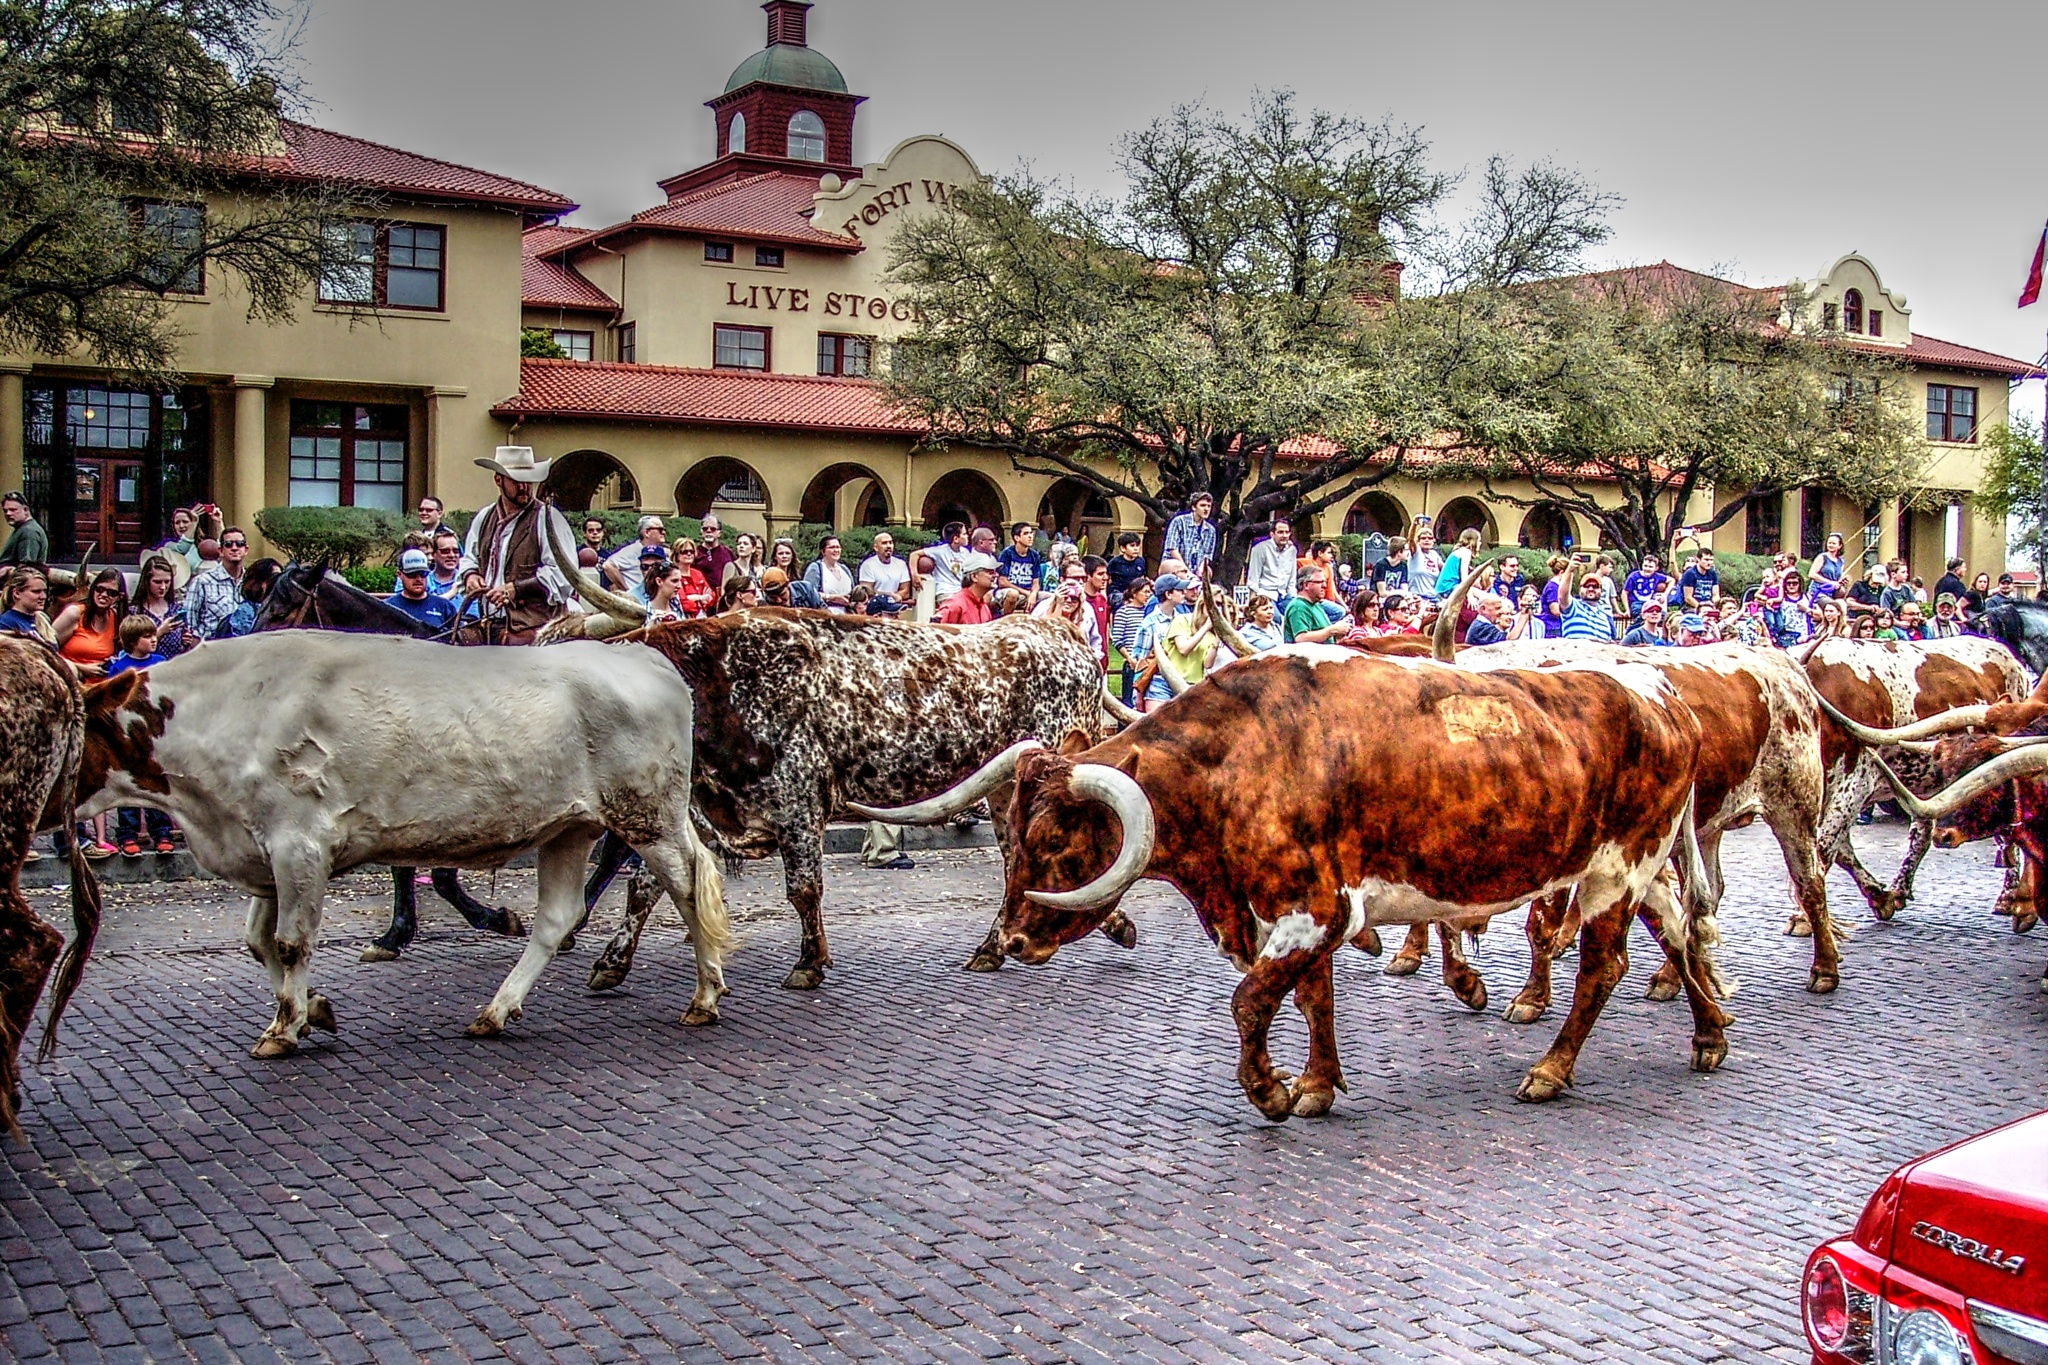 Ft. Worth Texas by Jaime Cantu